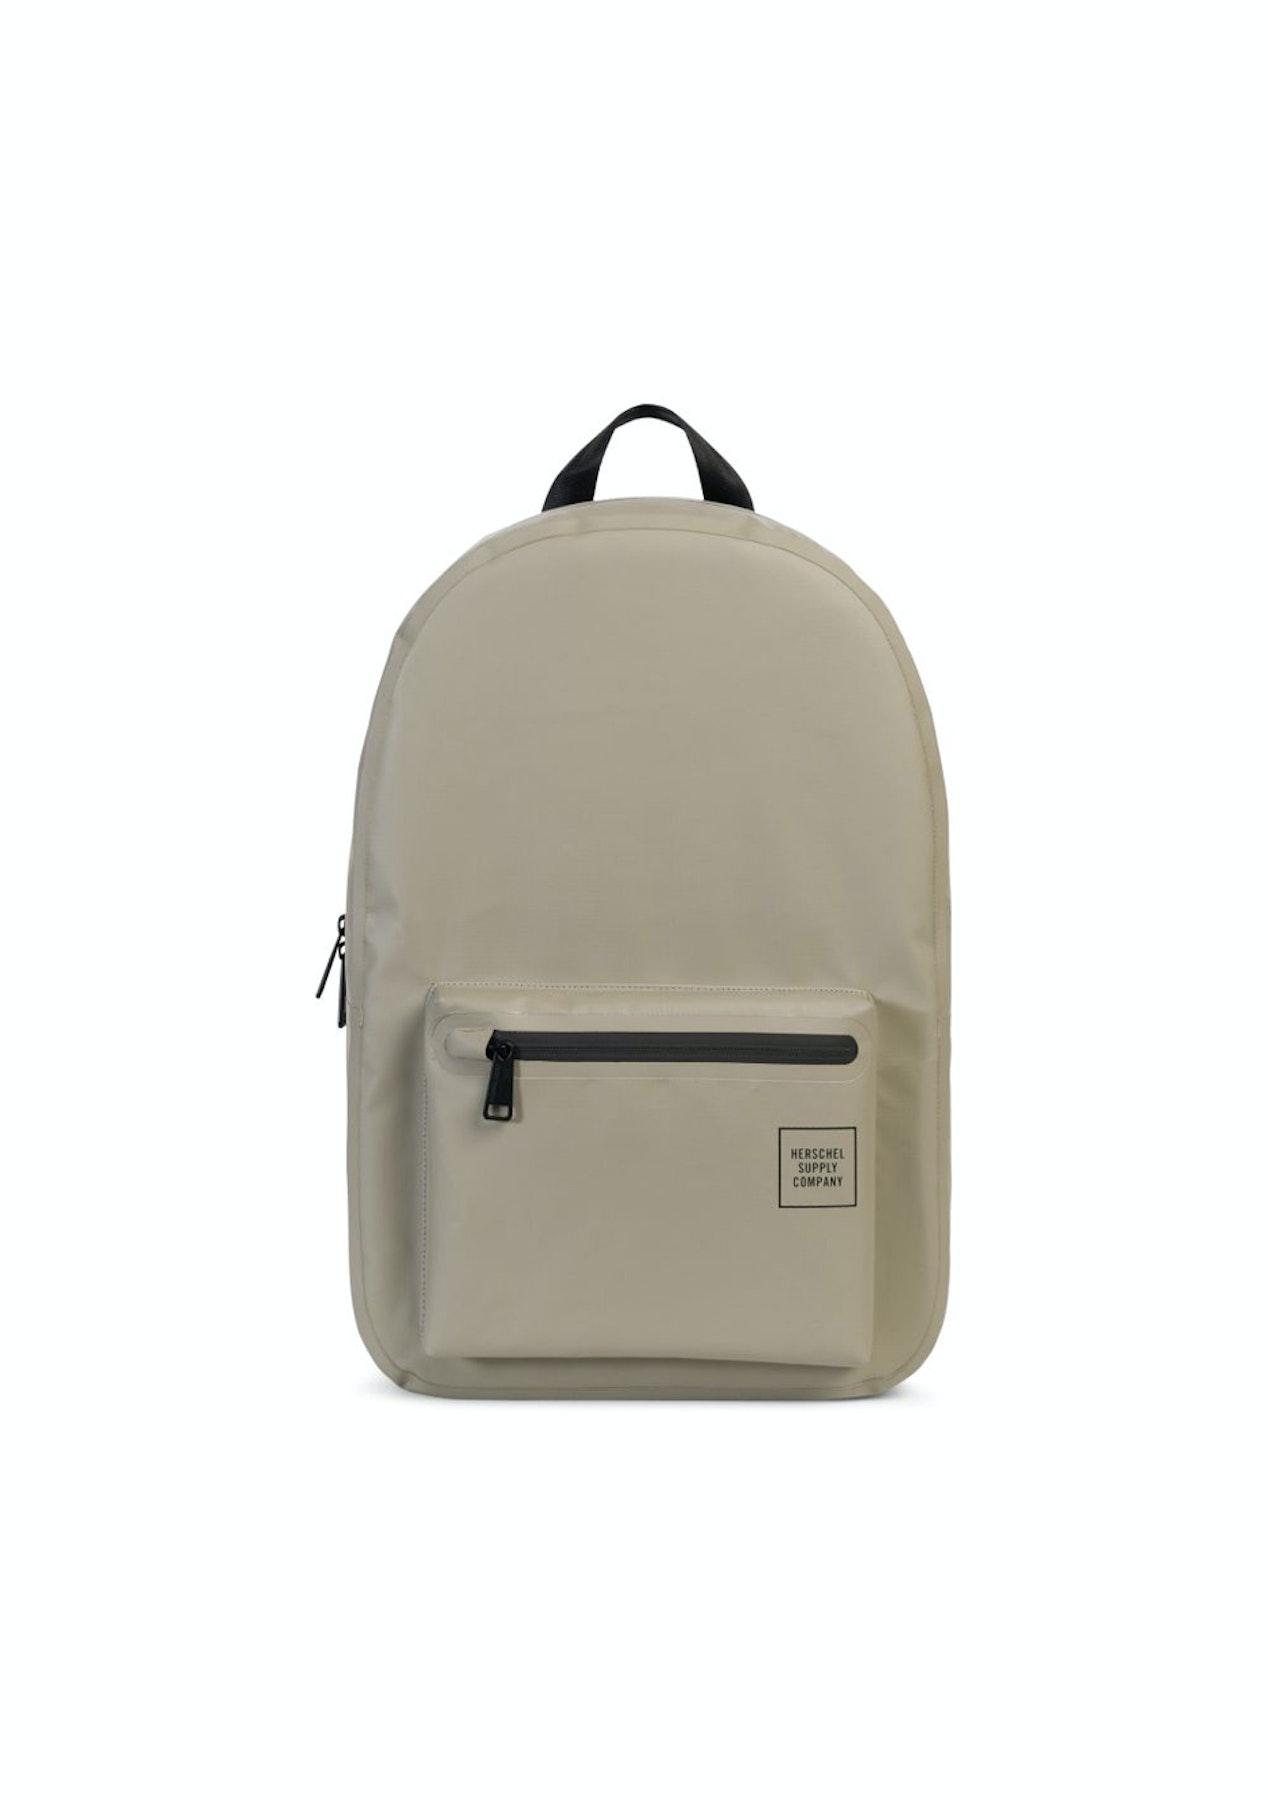 c52de5f1f4 Herschel - Settlement Backpack - Seneca Rock - Back Pack Clearance - Onceit